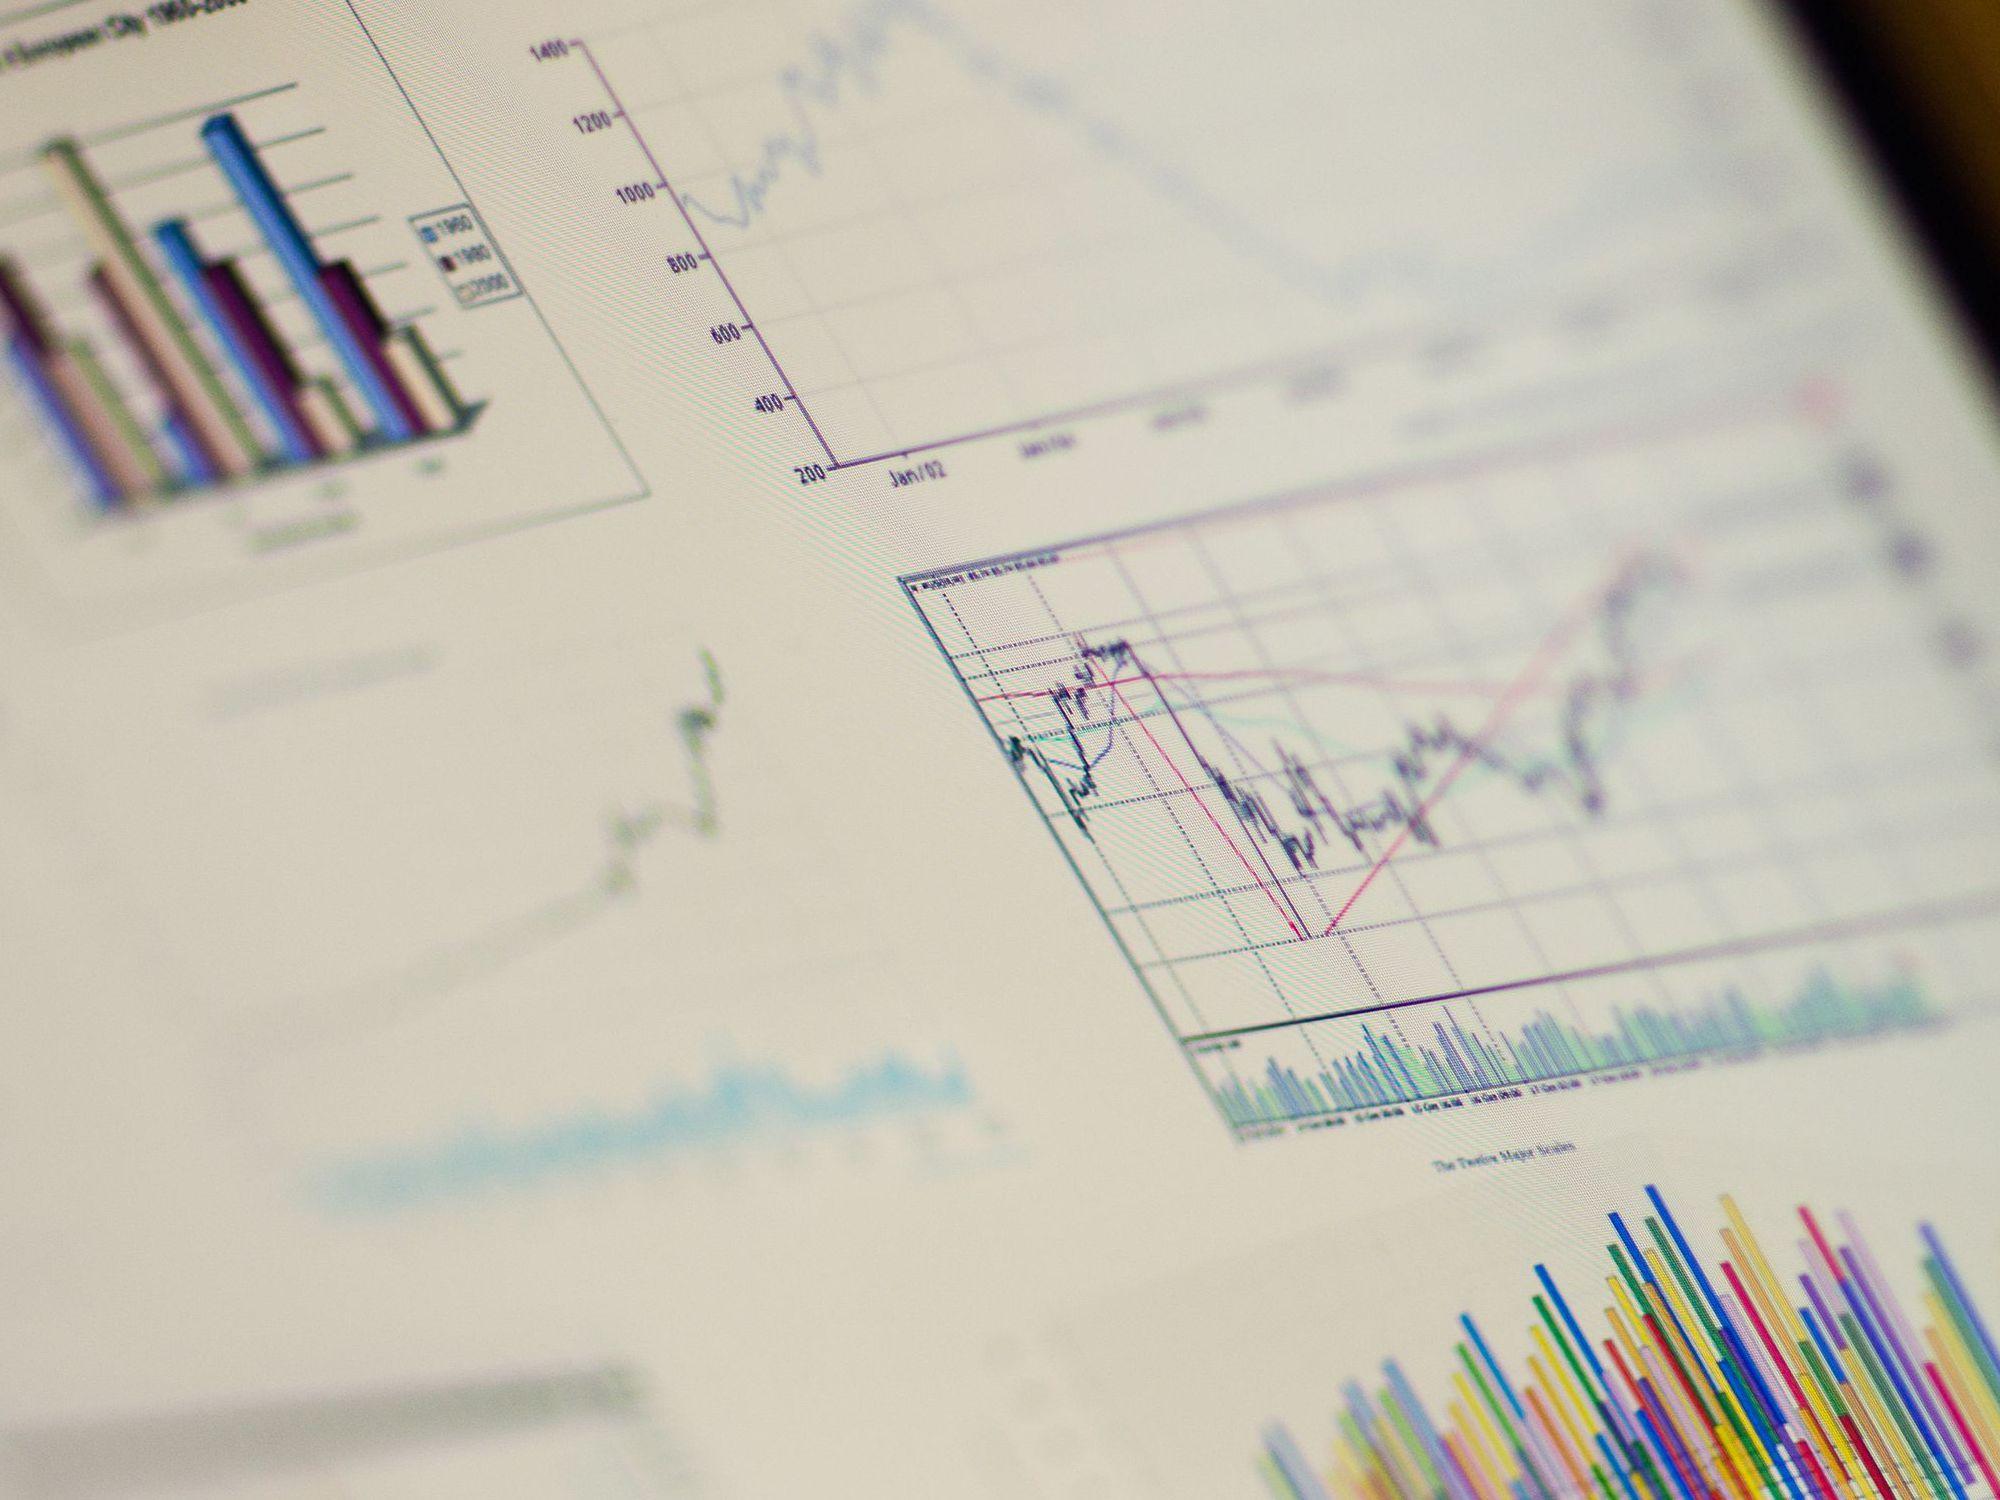 Data mining software